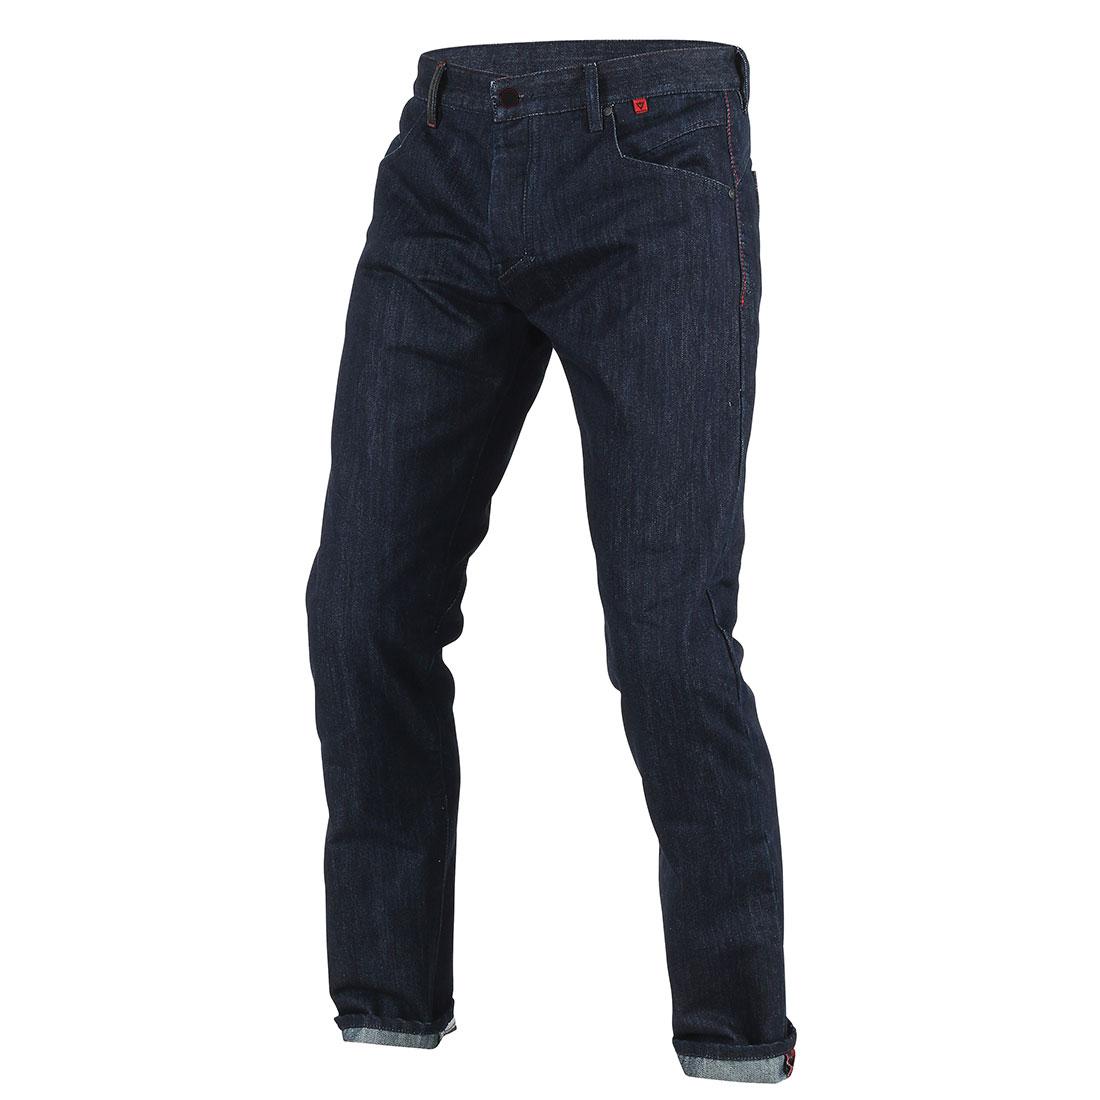 Dainese Strokeville Slim Jeans Aramid Denim